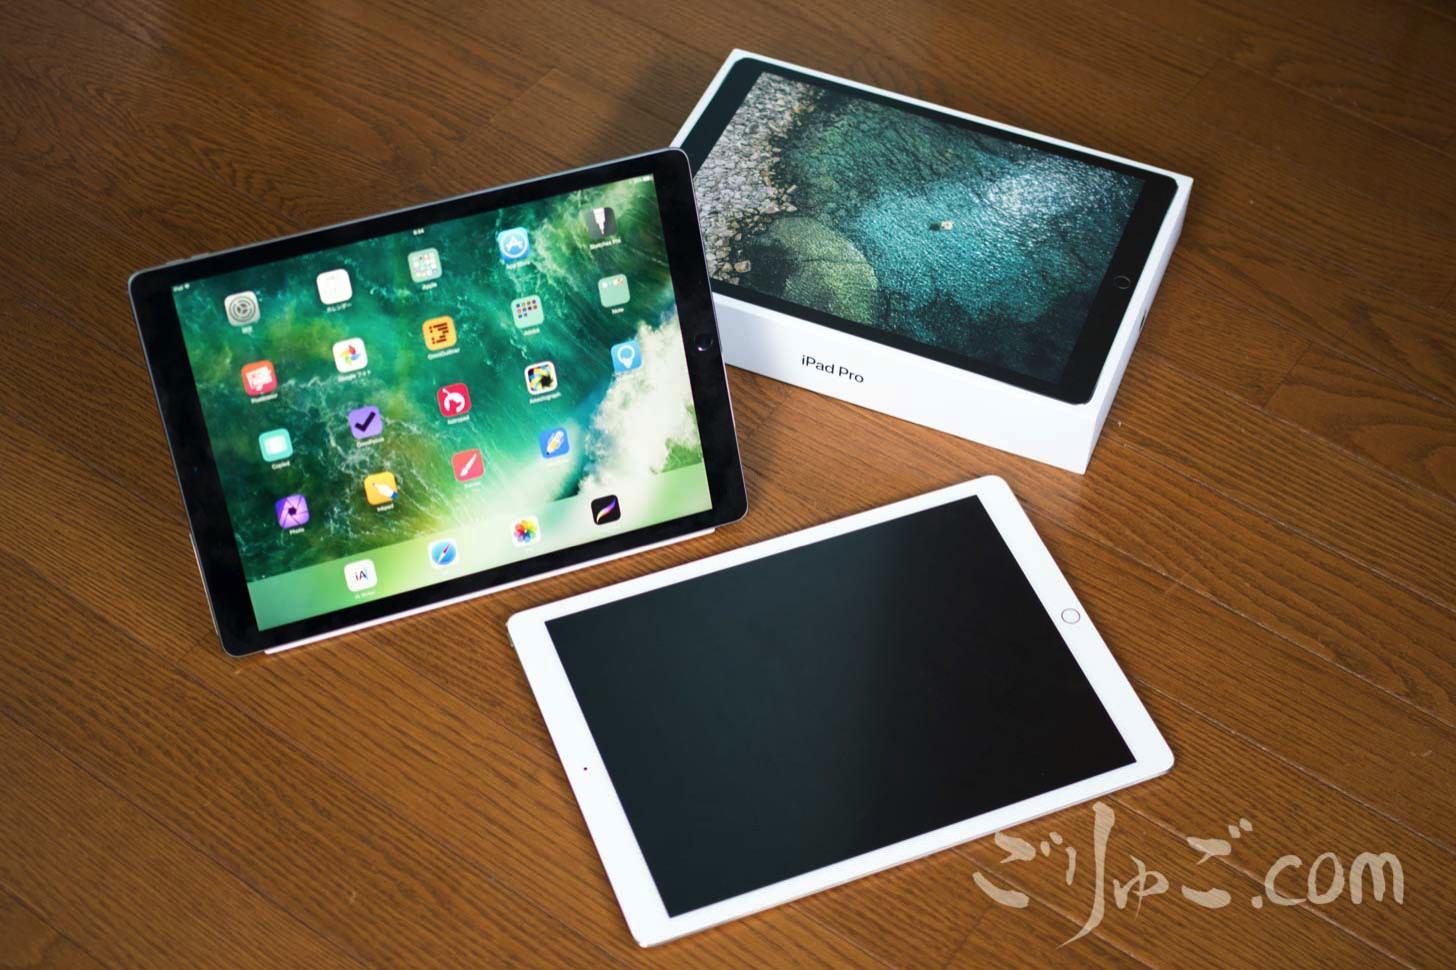 新旧iPadPro比較 1